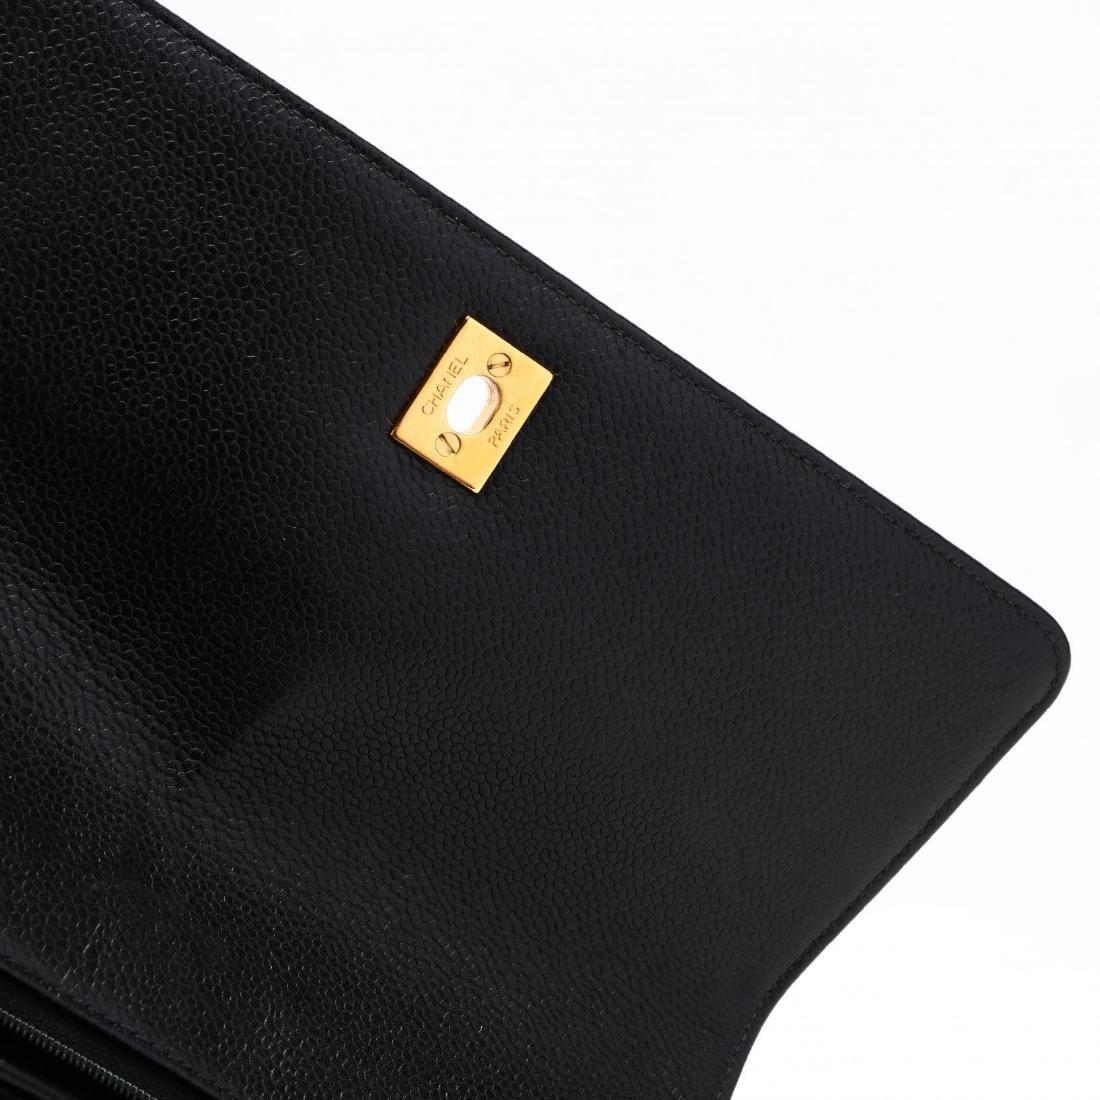 Caviar Leather Trapeze Flap Handbag, Chanel - 8